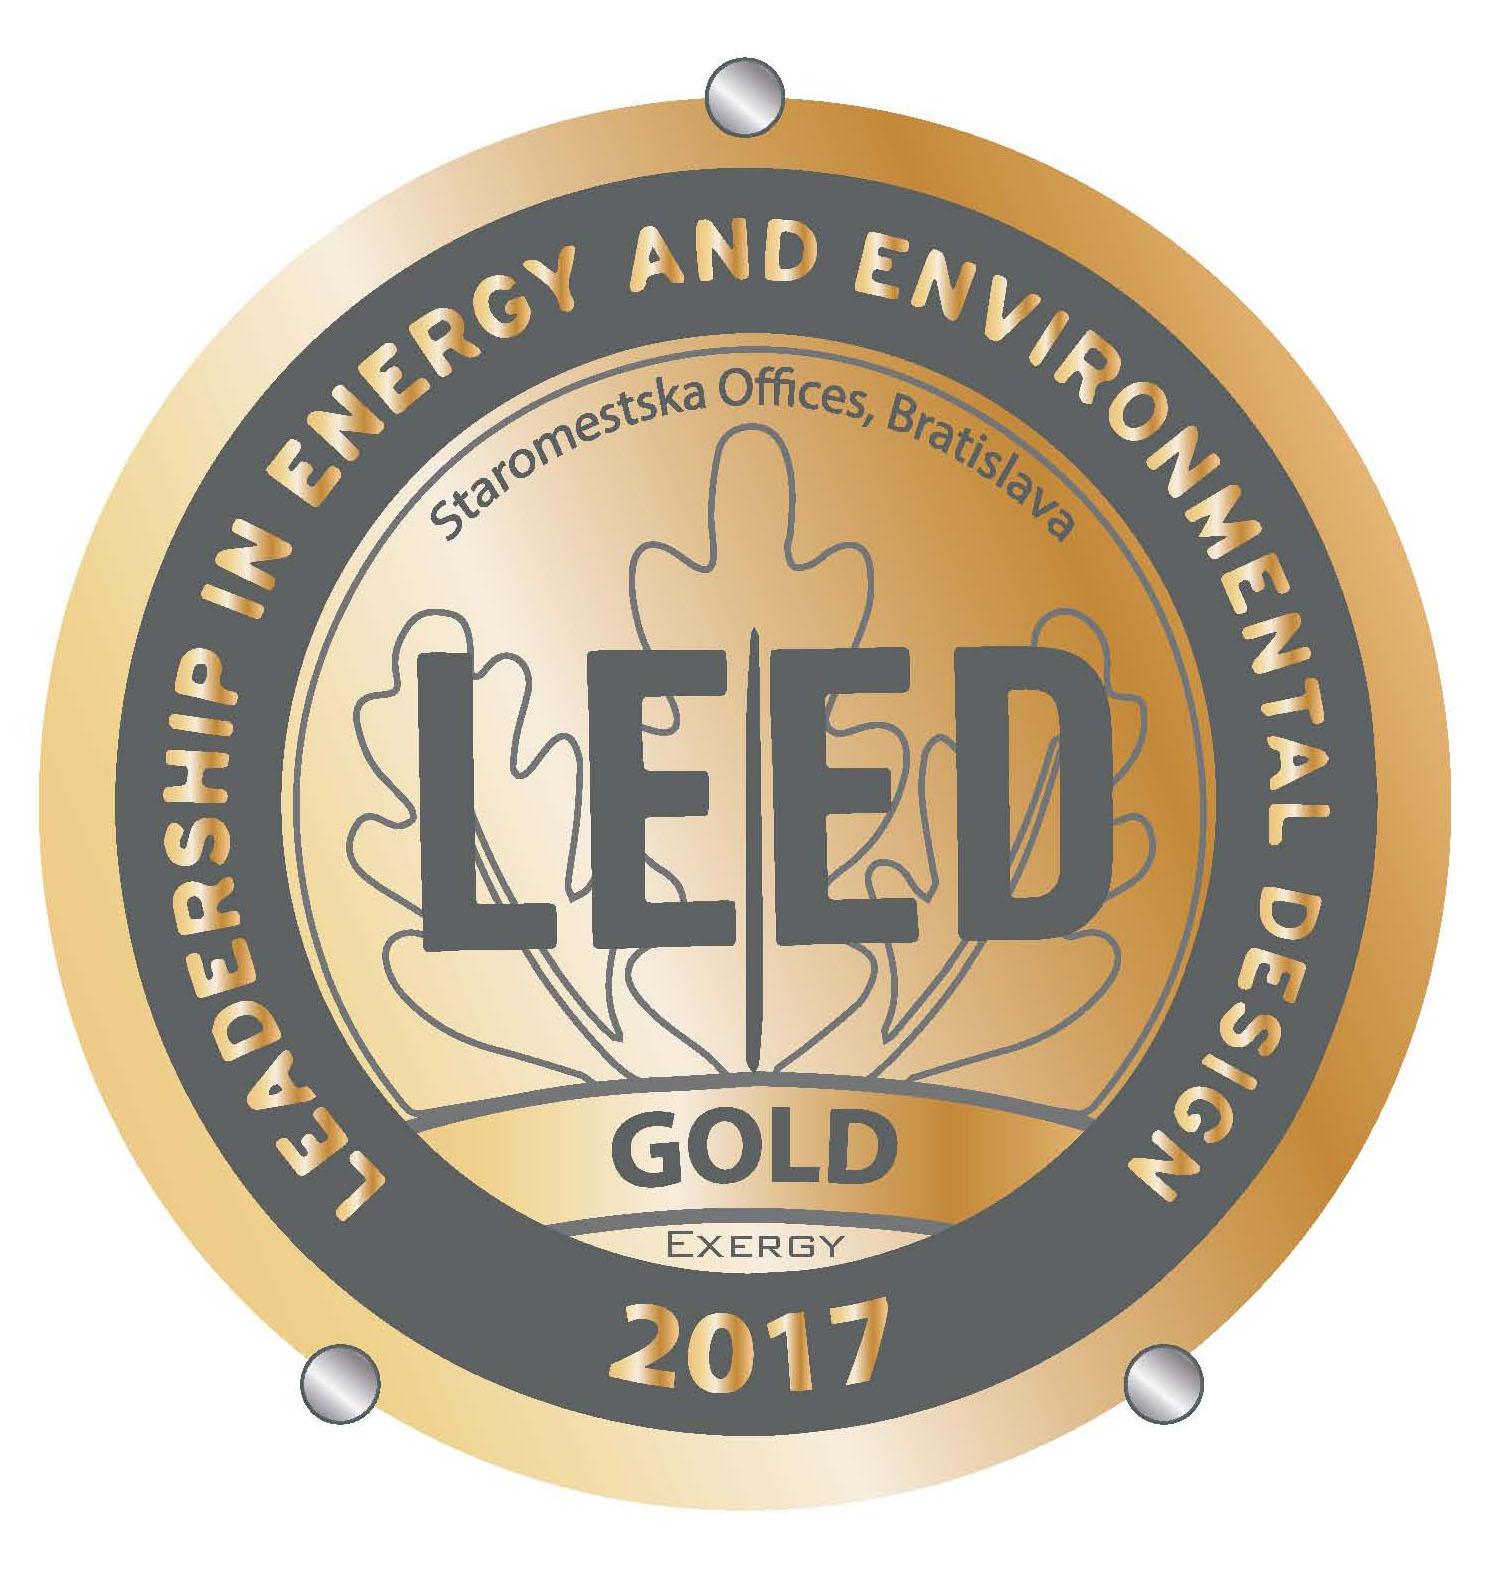 LEED gold logo 2017.jpg